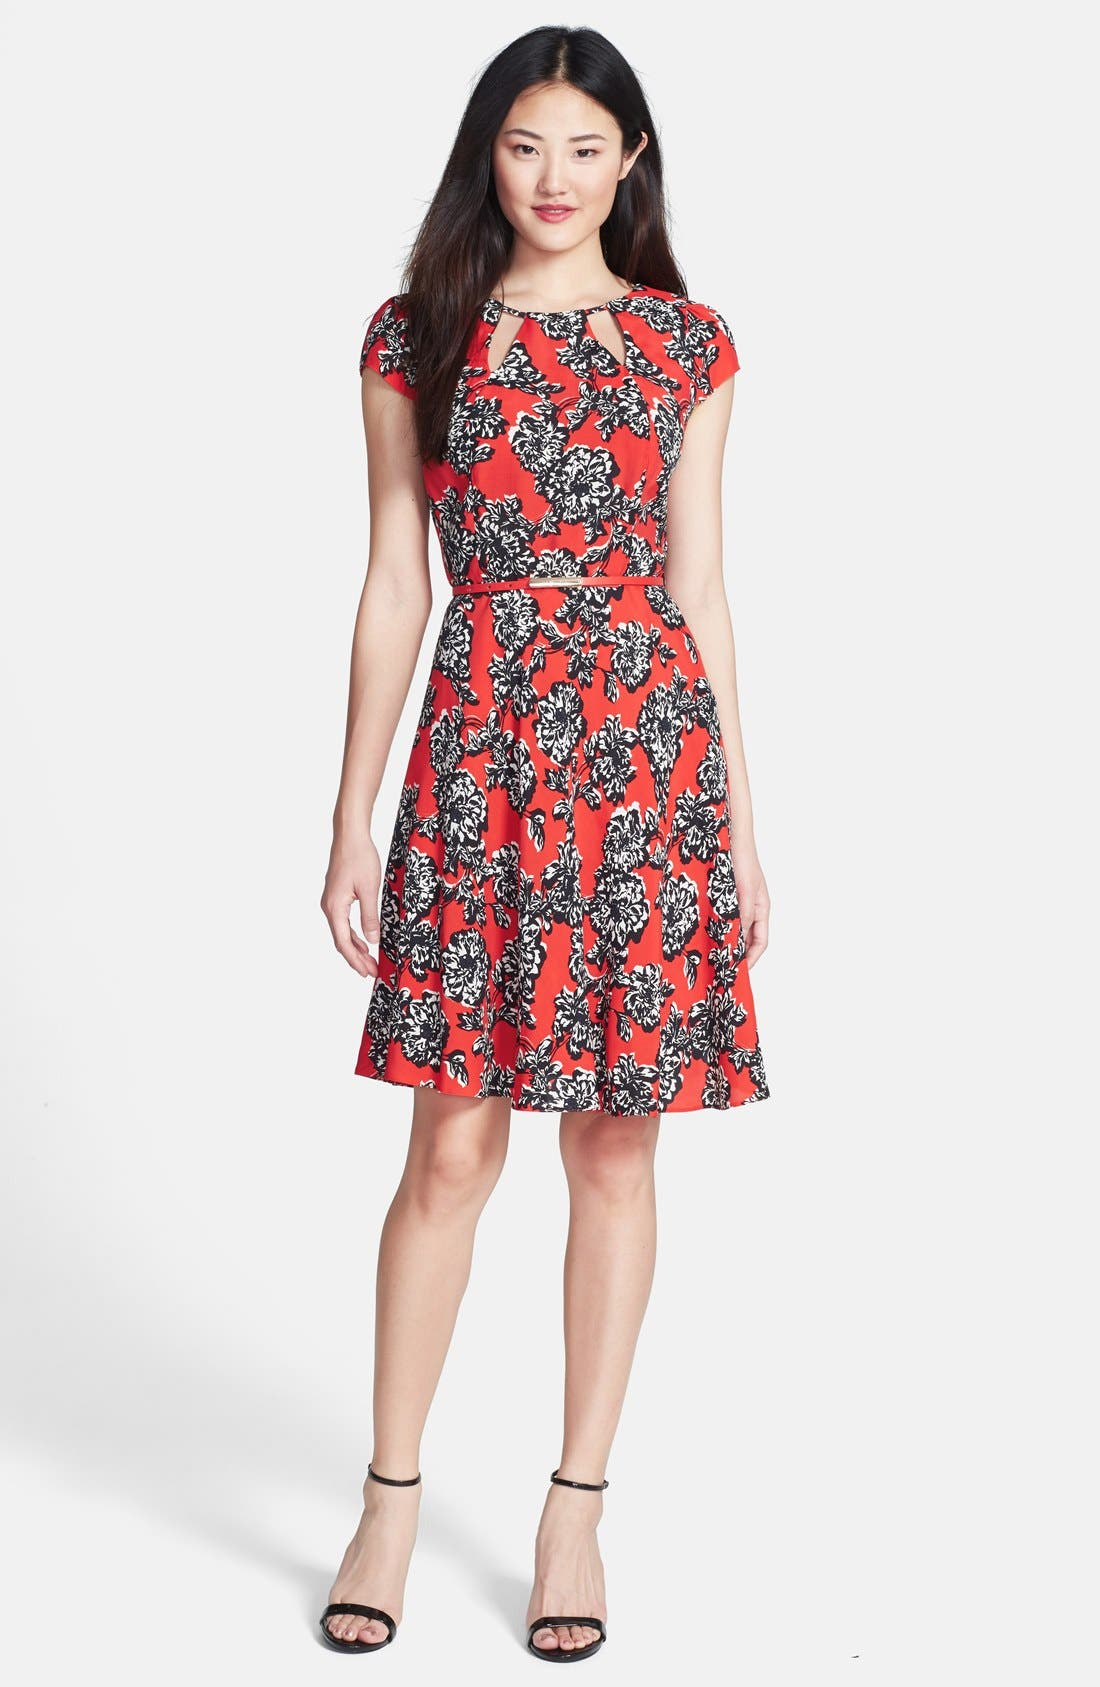 Alternate Image 1 Selected - Wallis Floral Print Fit & Flare Dress